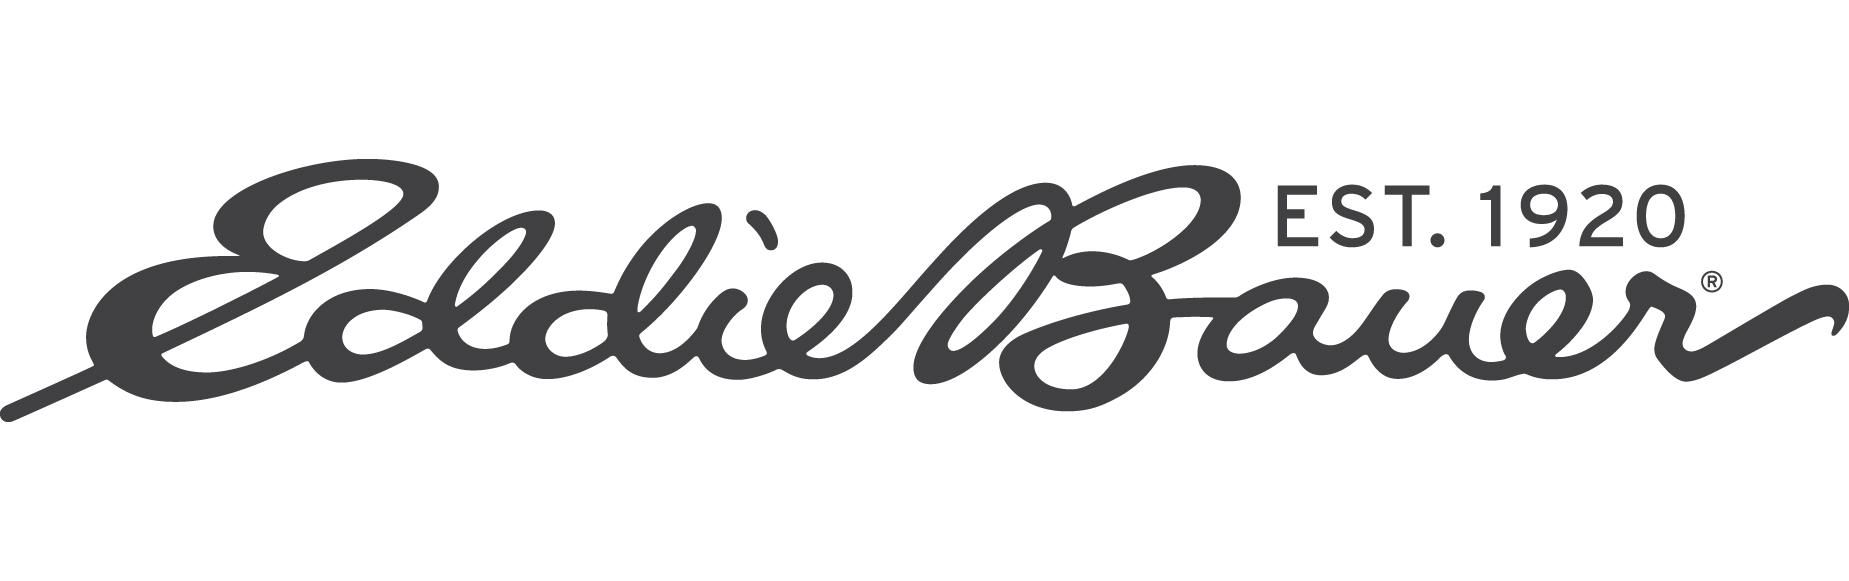 logo_eb_header.jpg